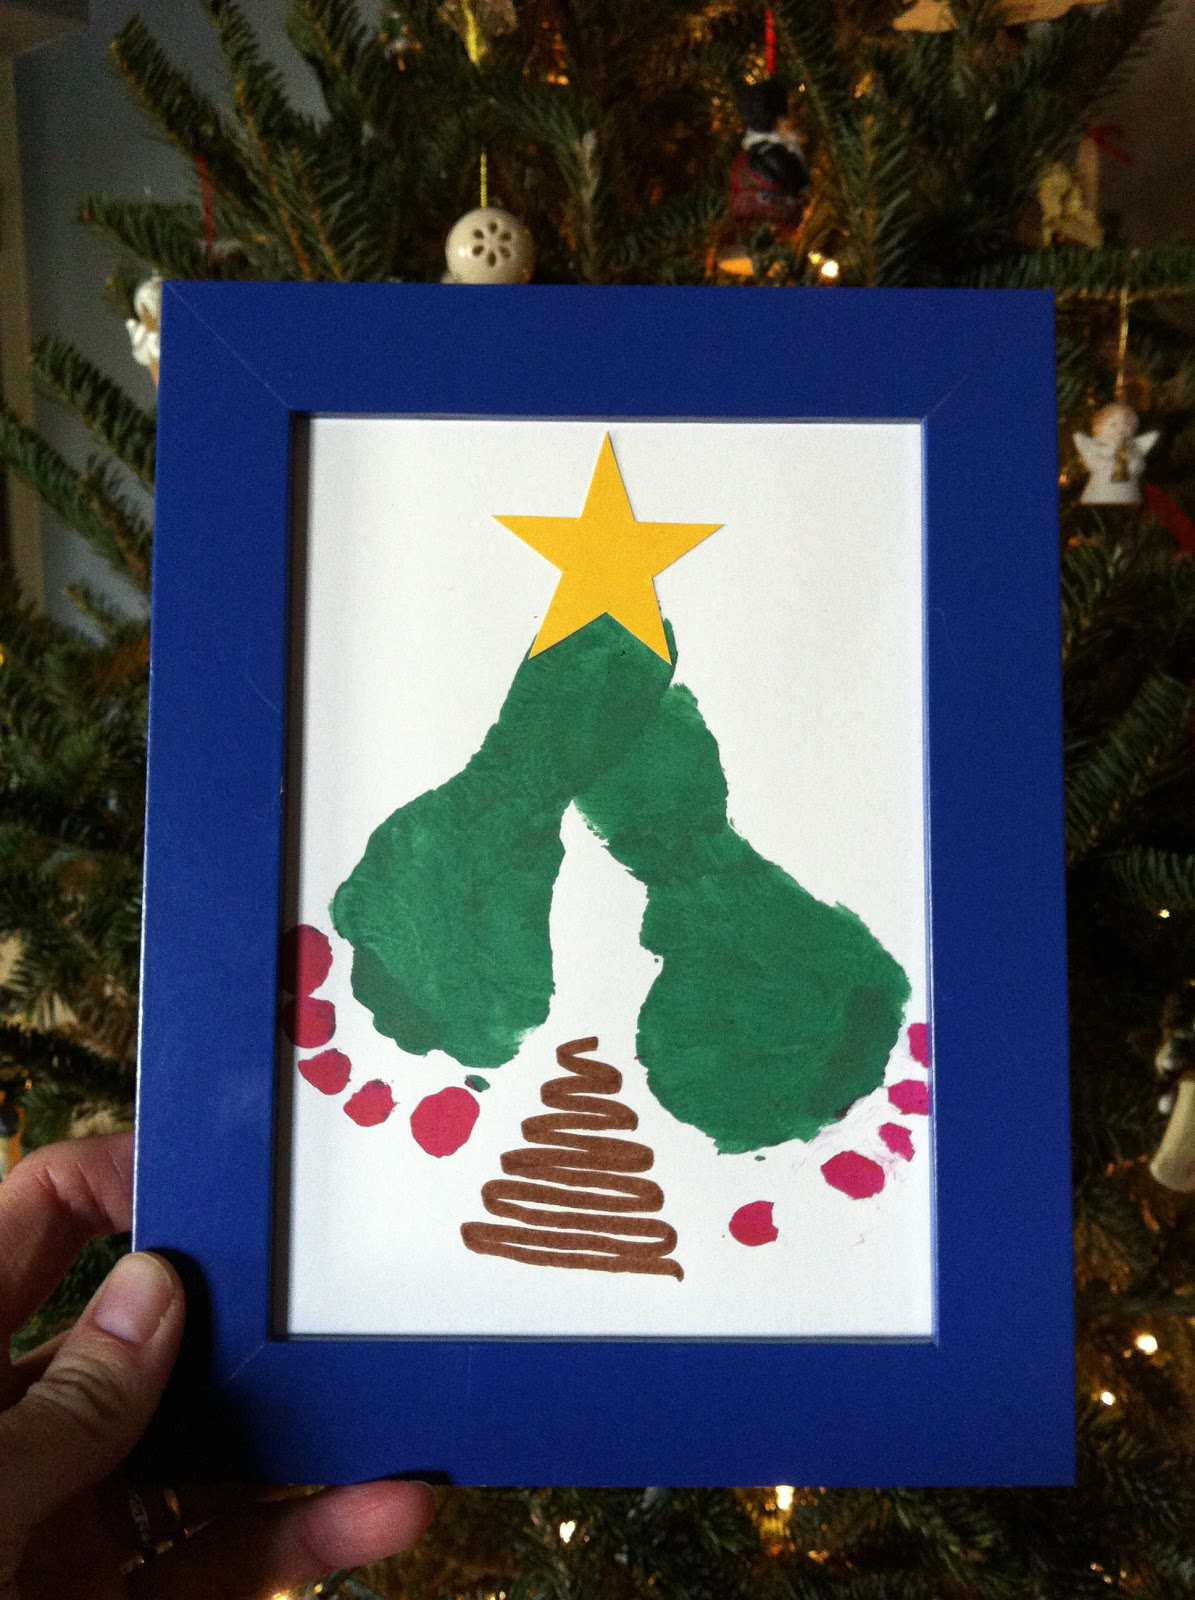 Christmas Display Ideas For Nursery.20 Christmas Tree Crafts For Kids